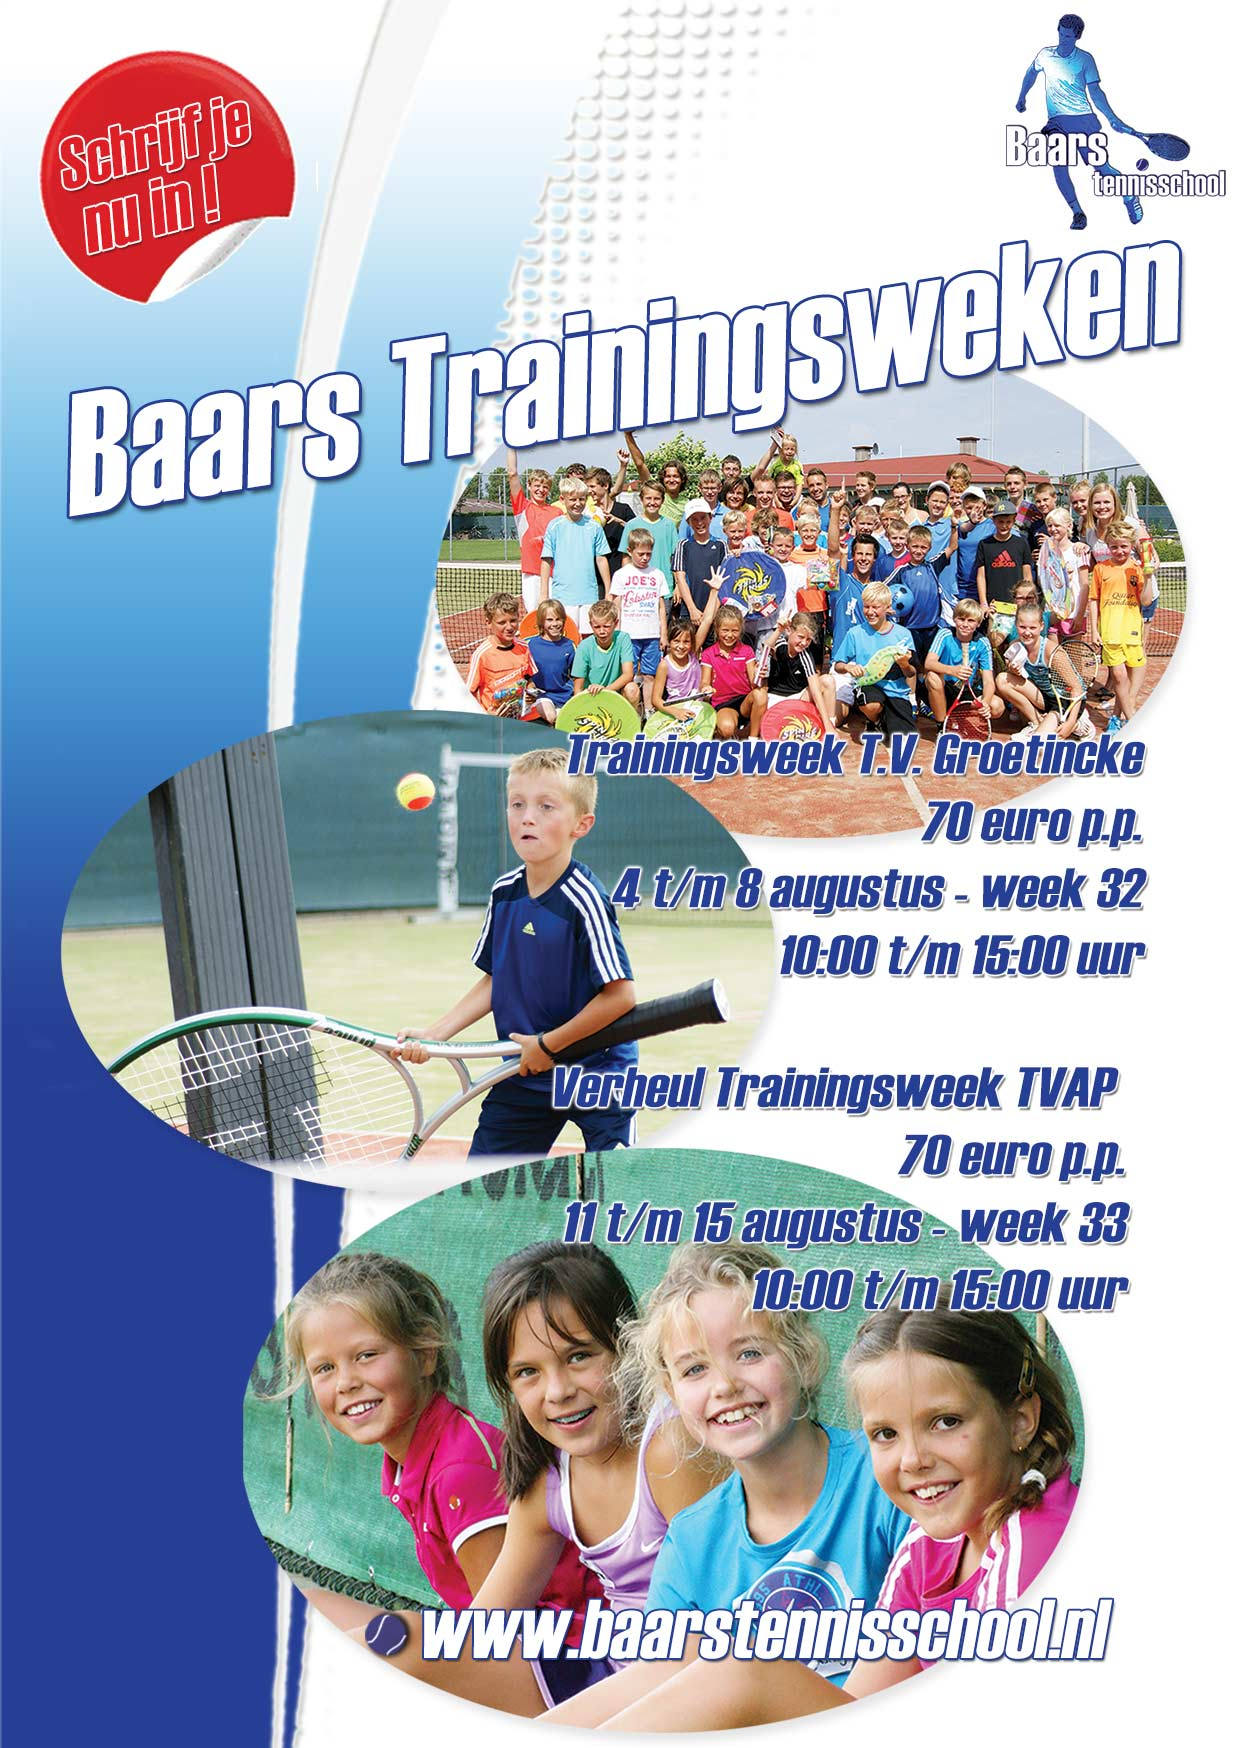 Flyer Baars Trainingsweken 2014